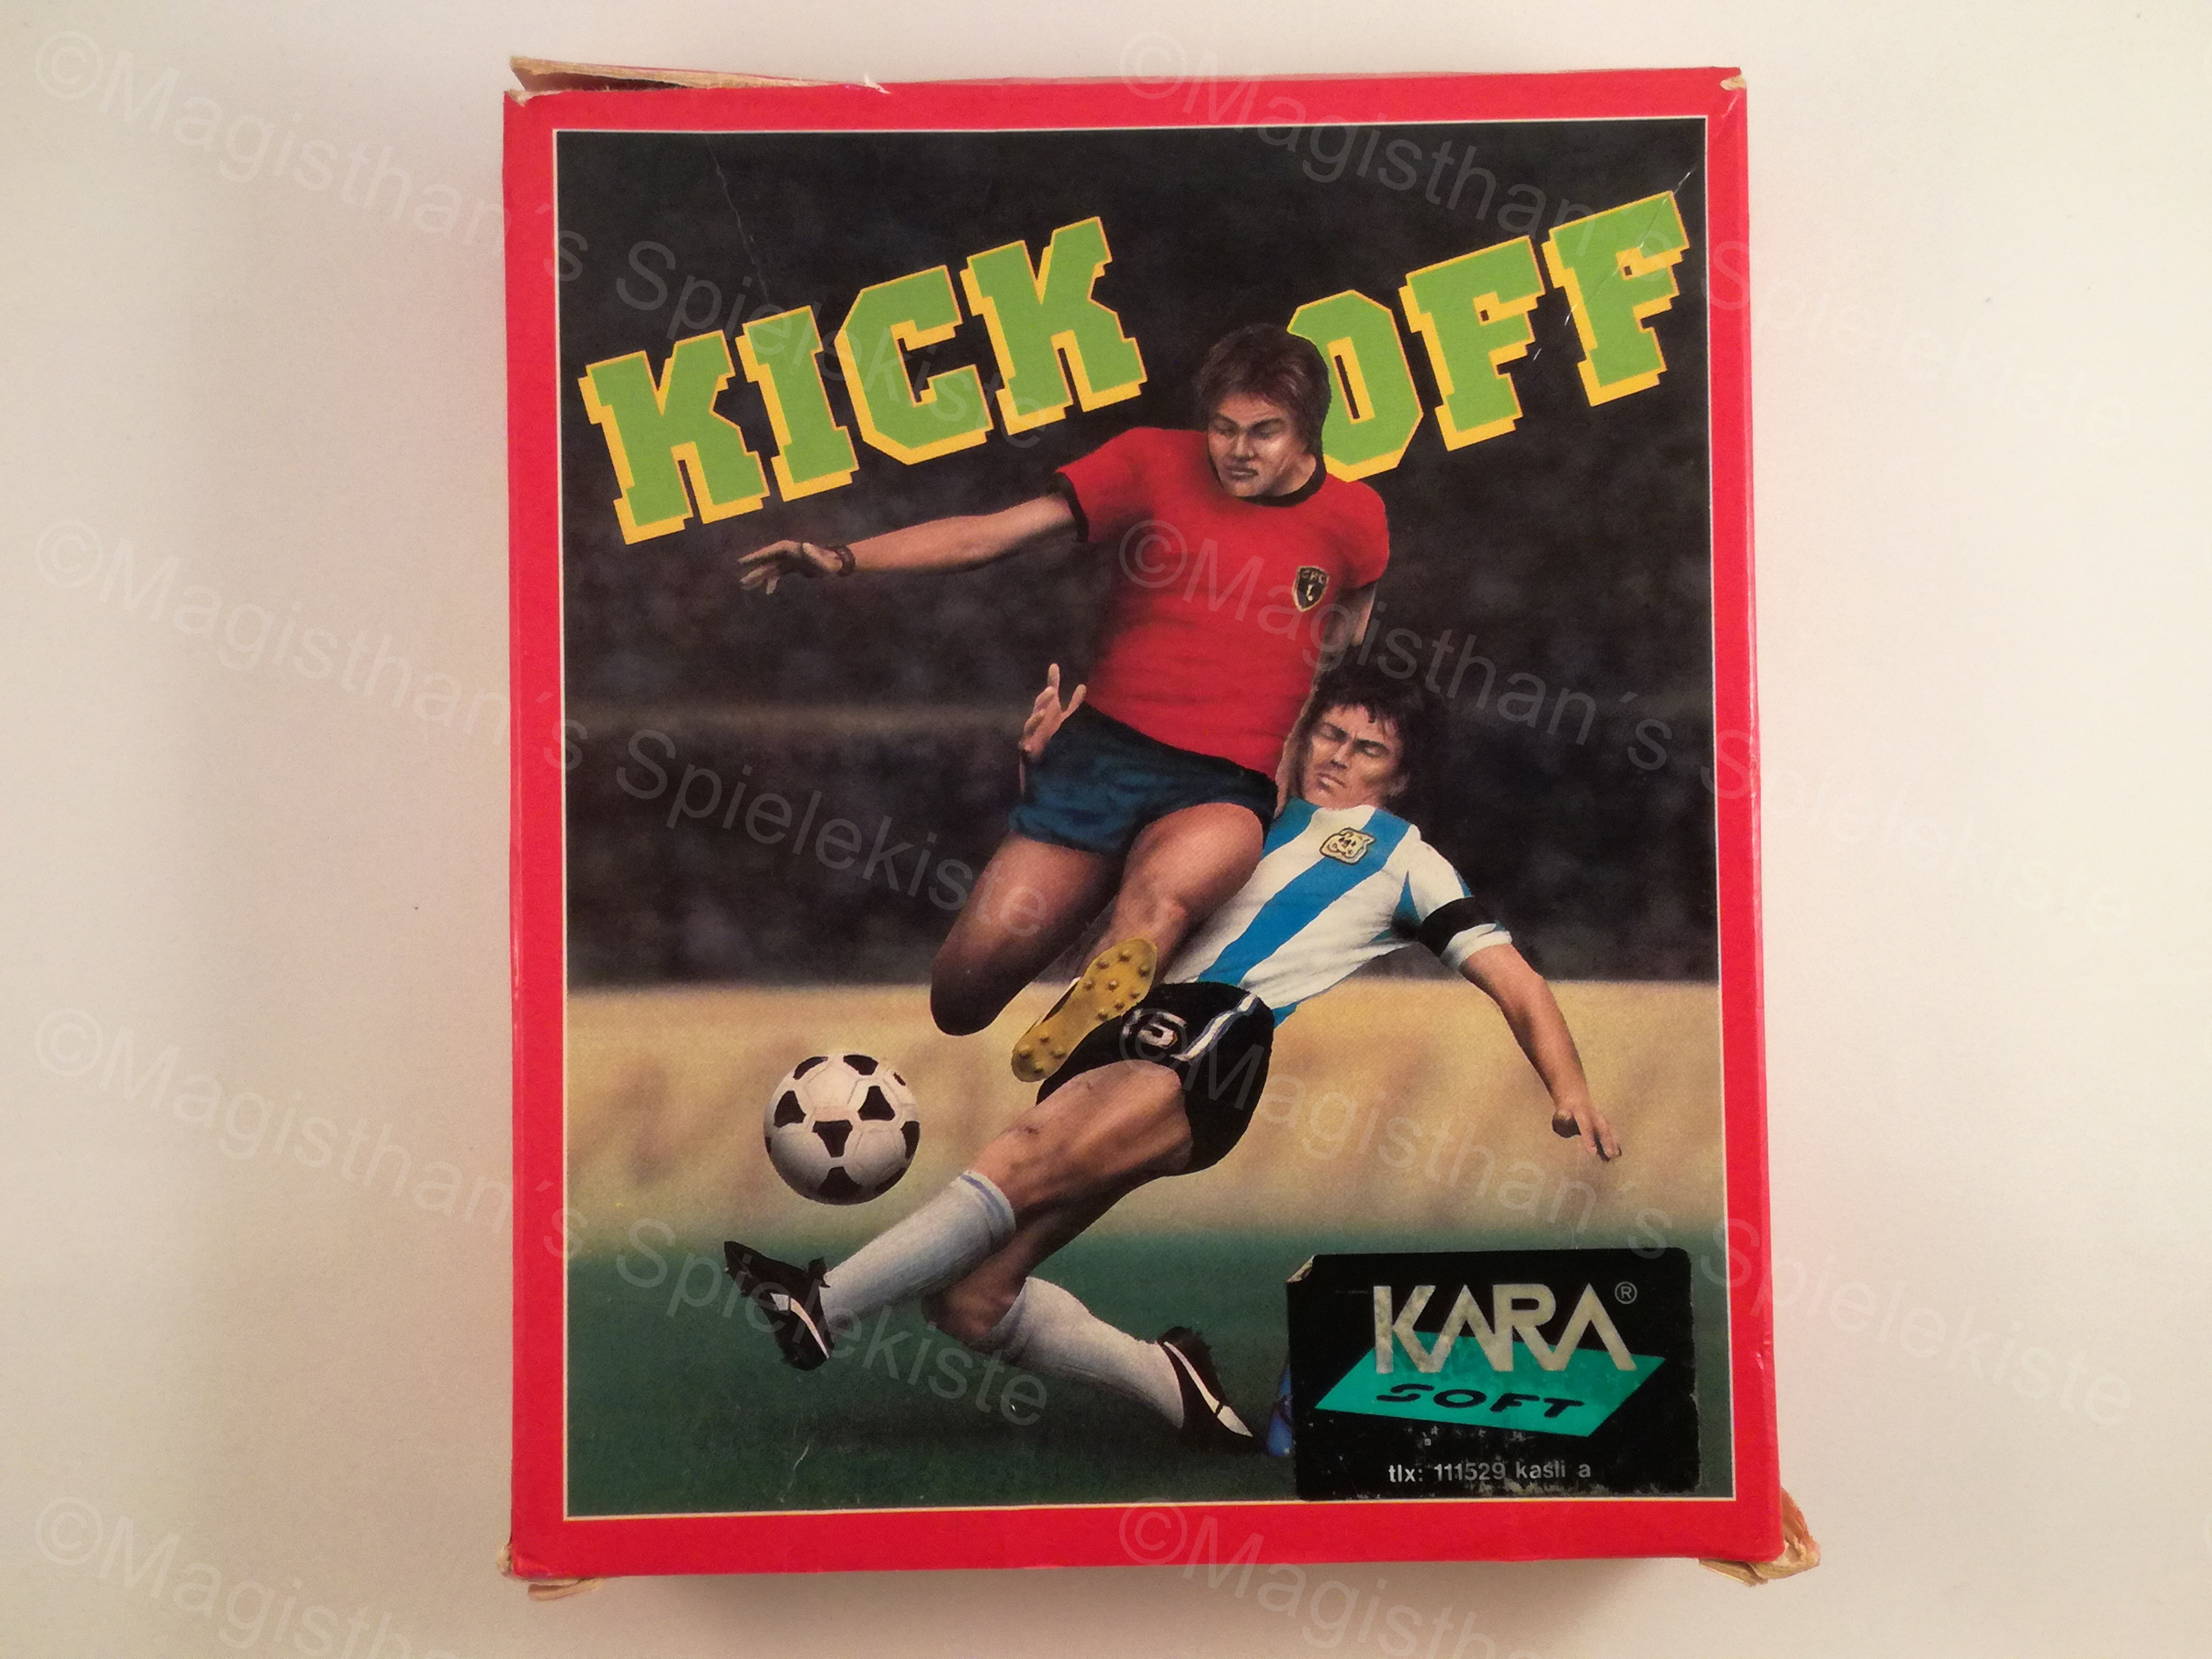 KickOff1Amiga1.jpg